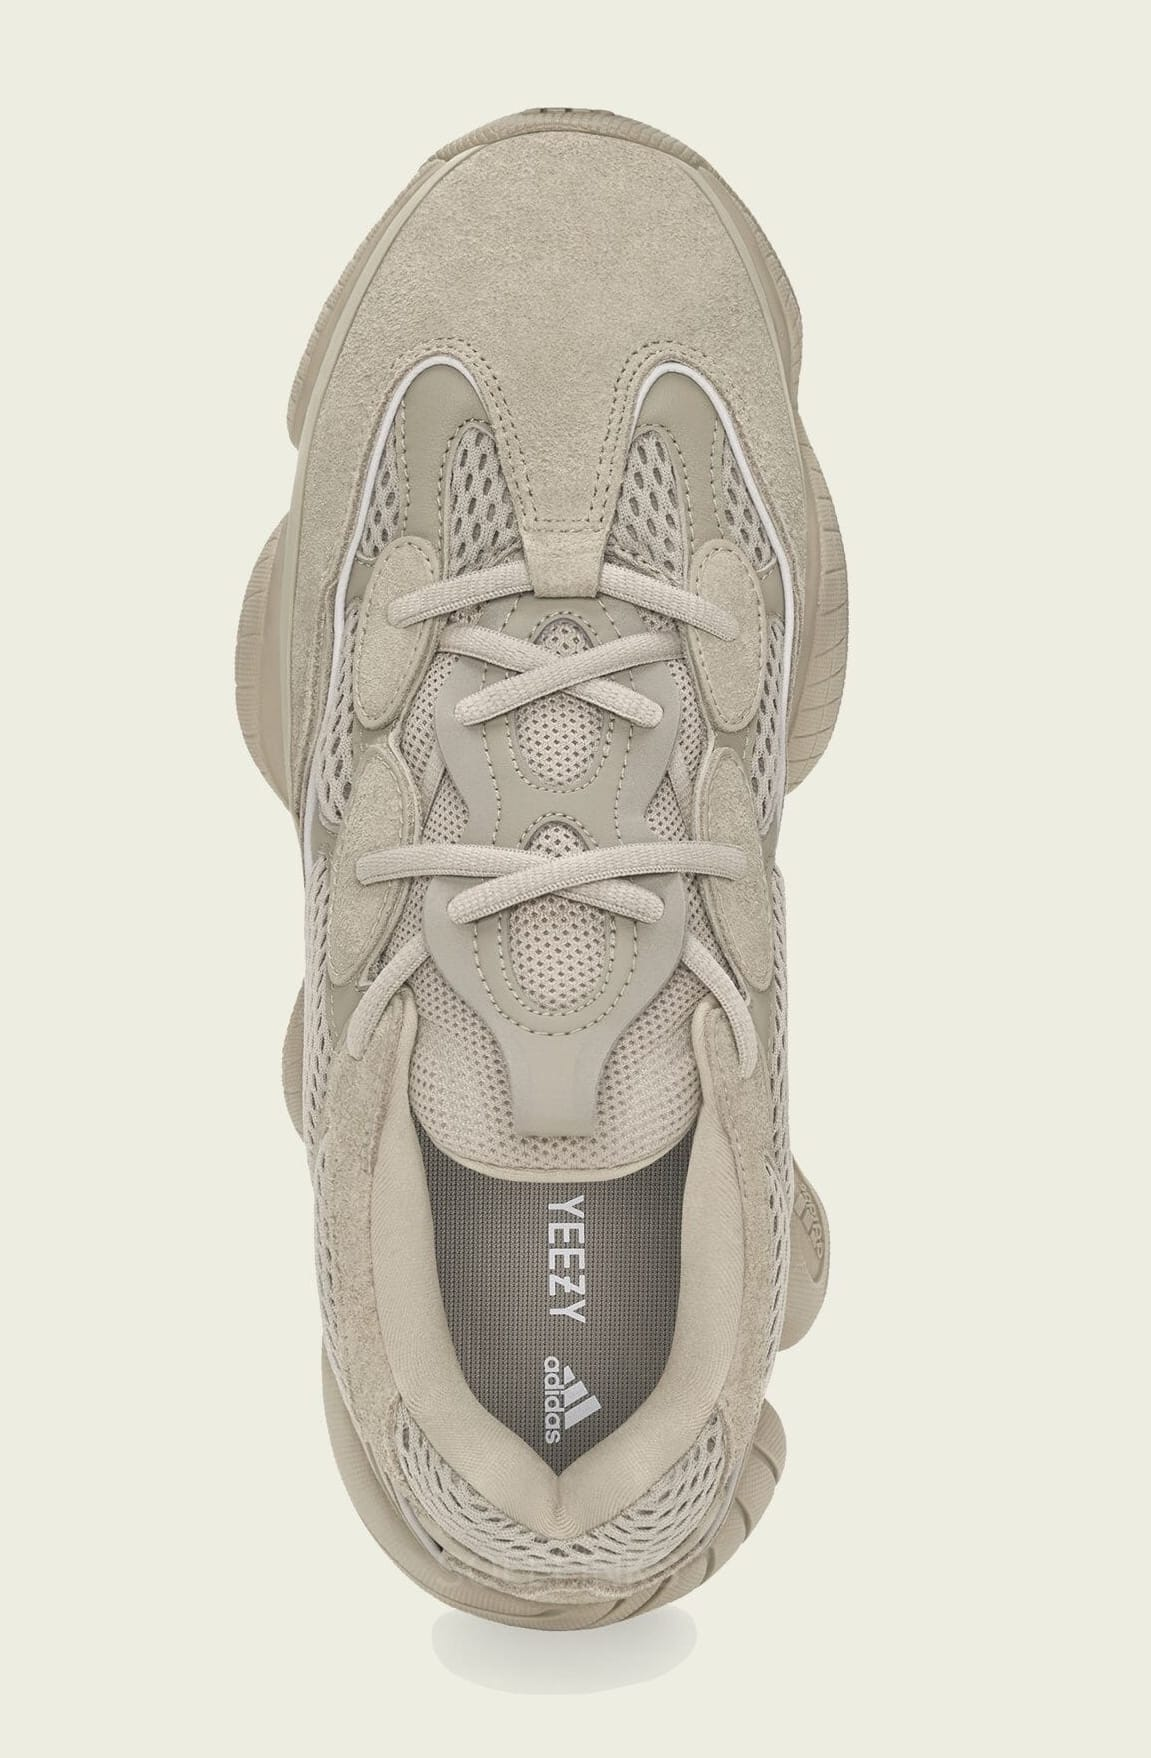 Adidas Yeezy 500 'Taupe Light' Top